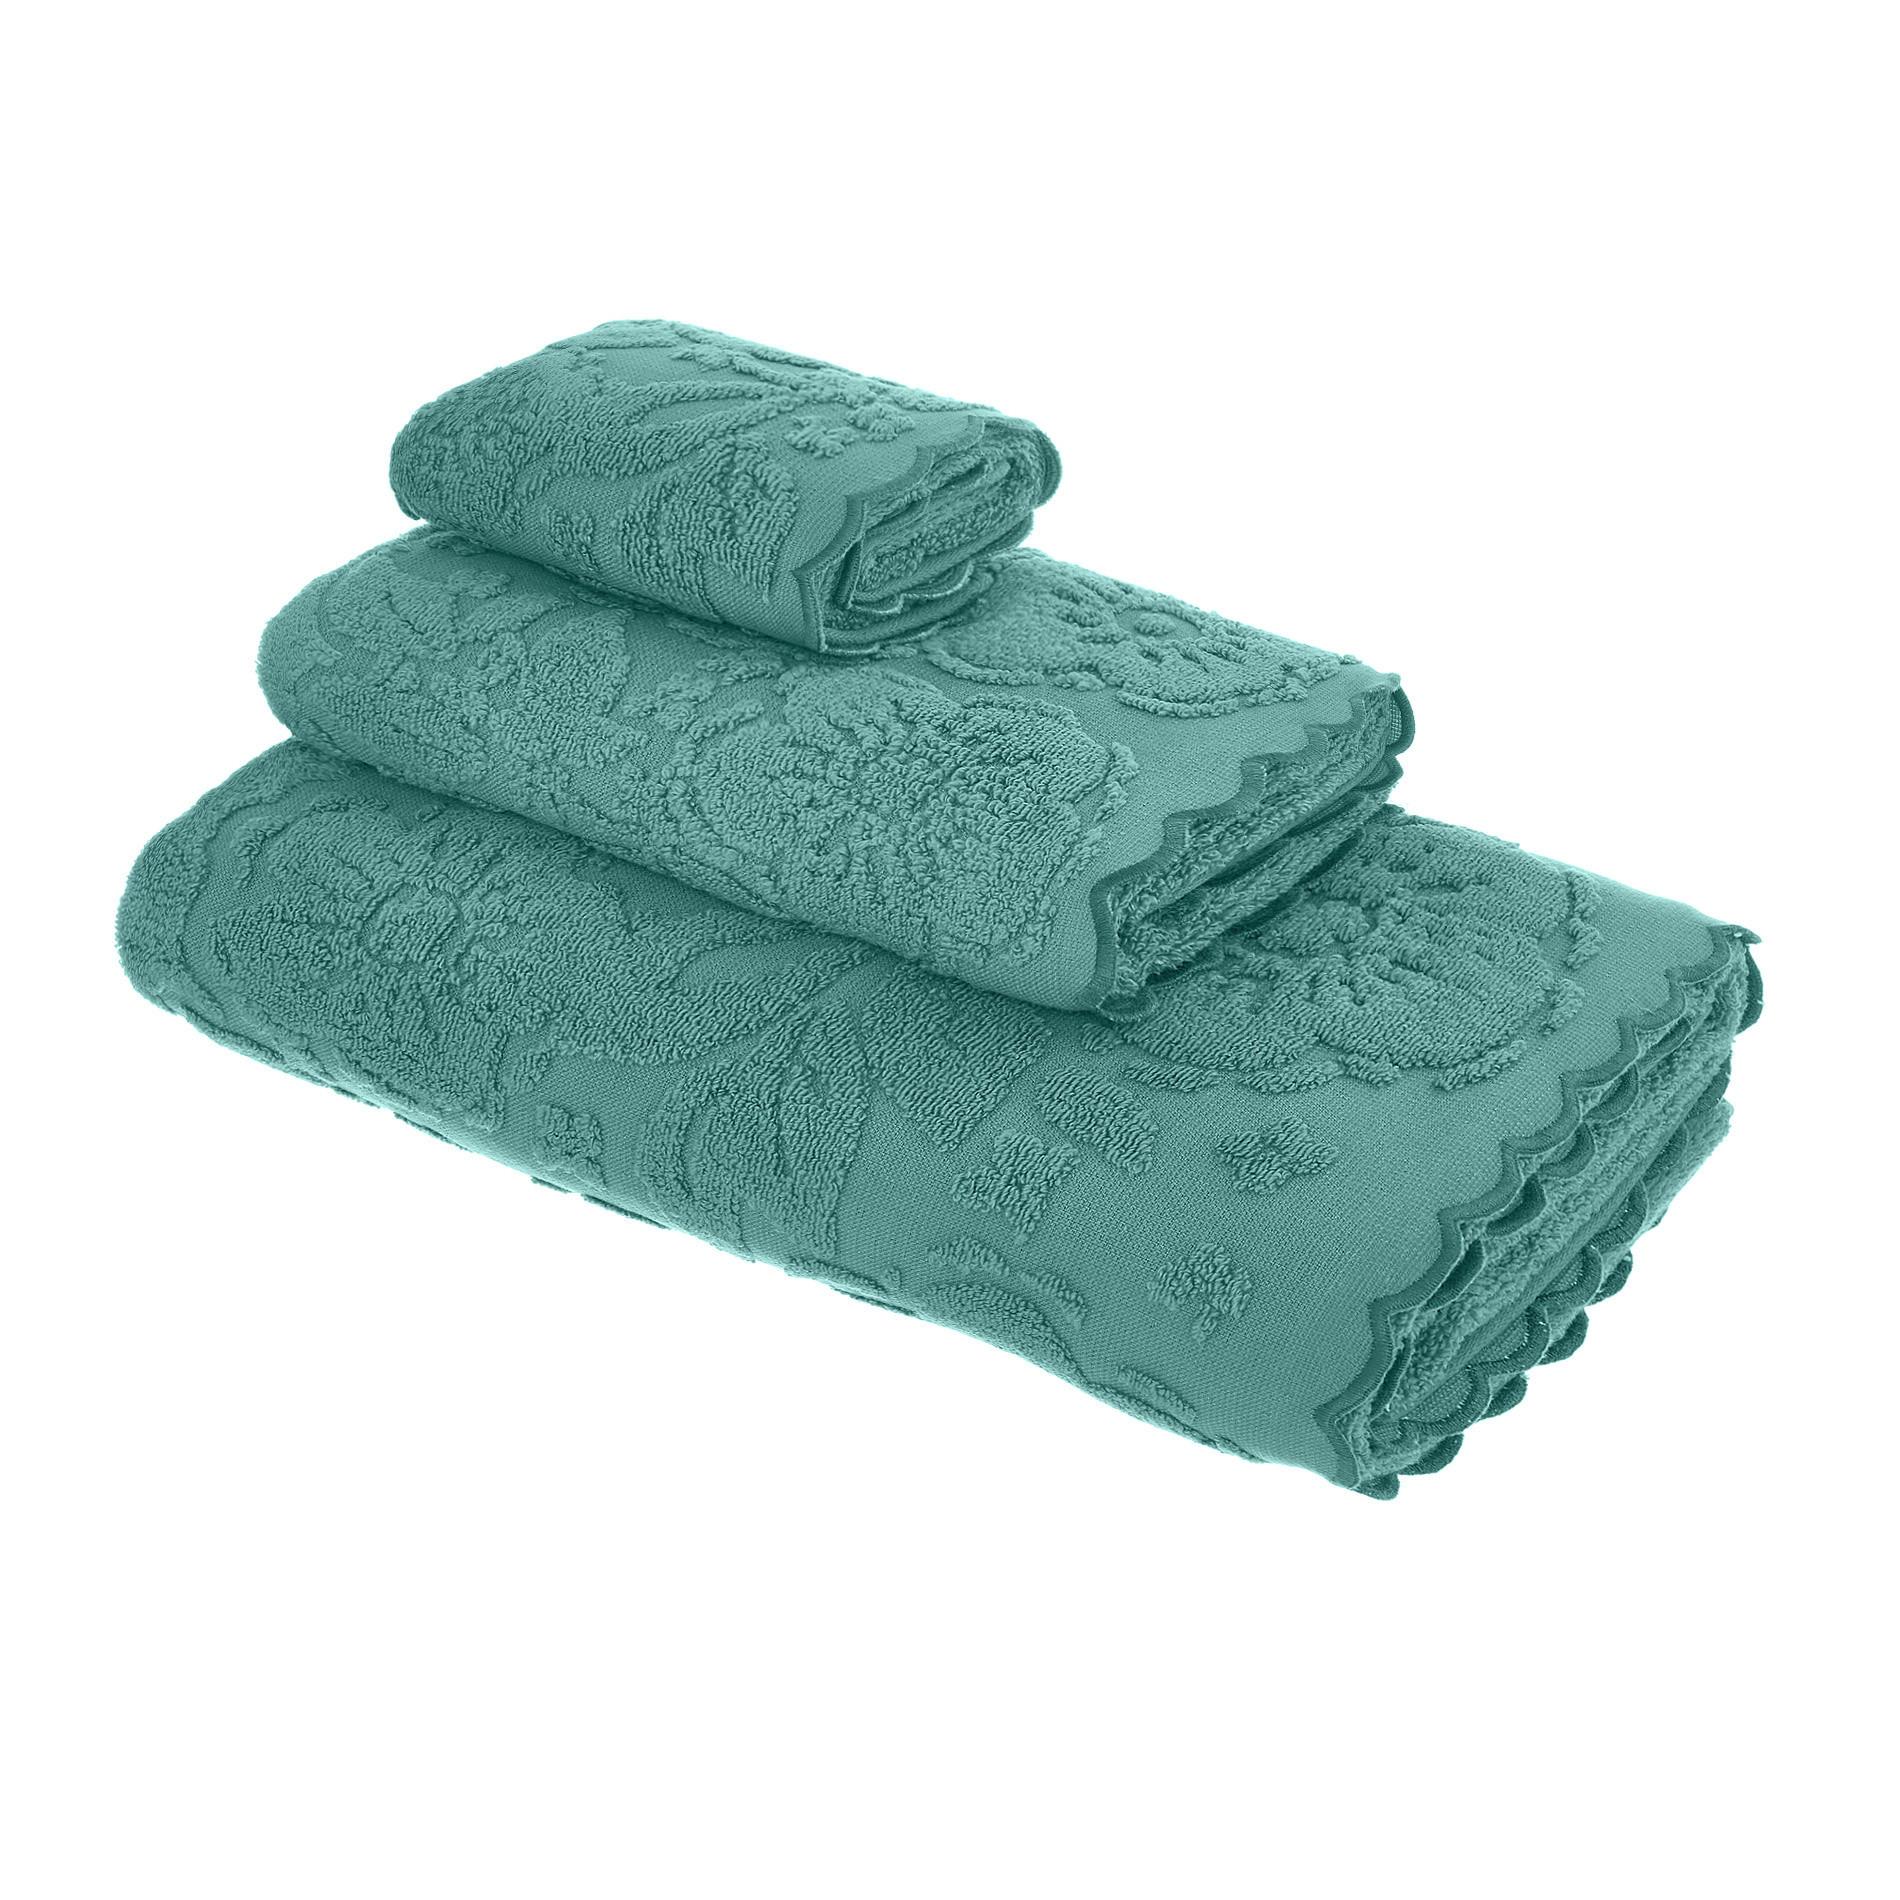 Asciugamano spugna di cotone bordo jacquard, Verde ottanio, large image number 0